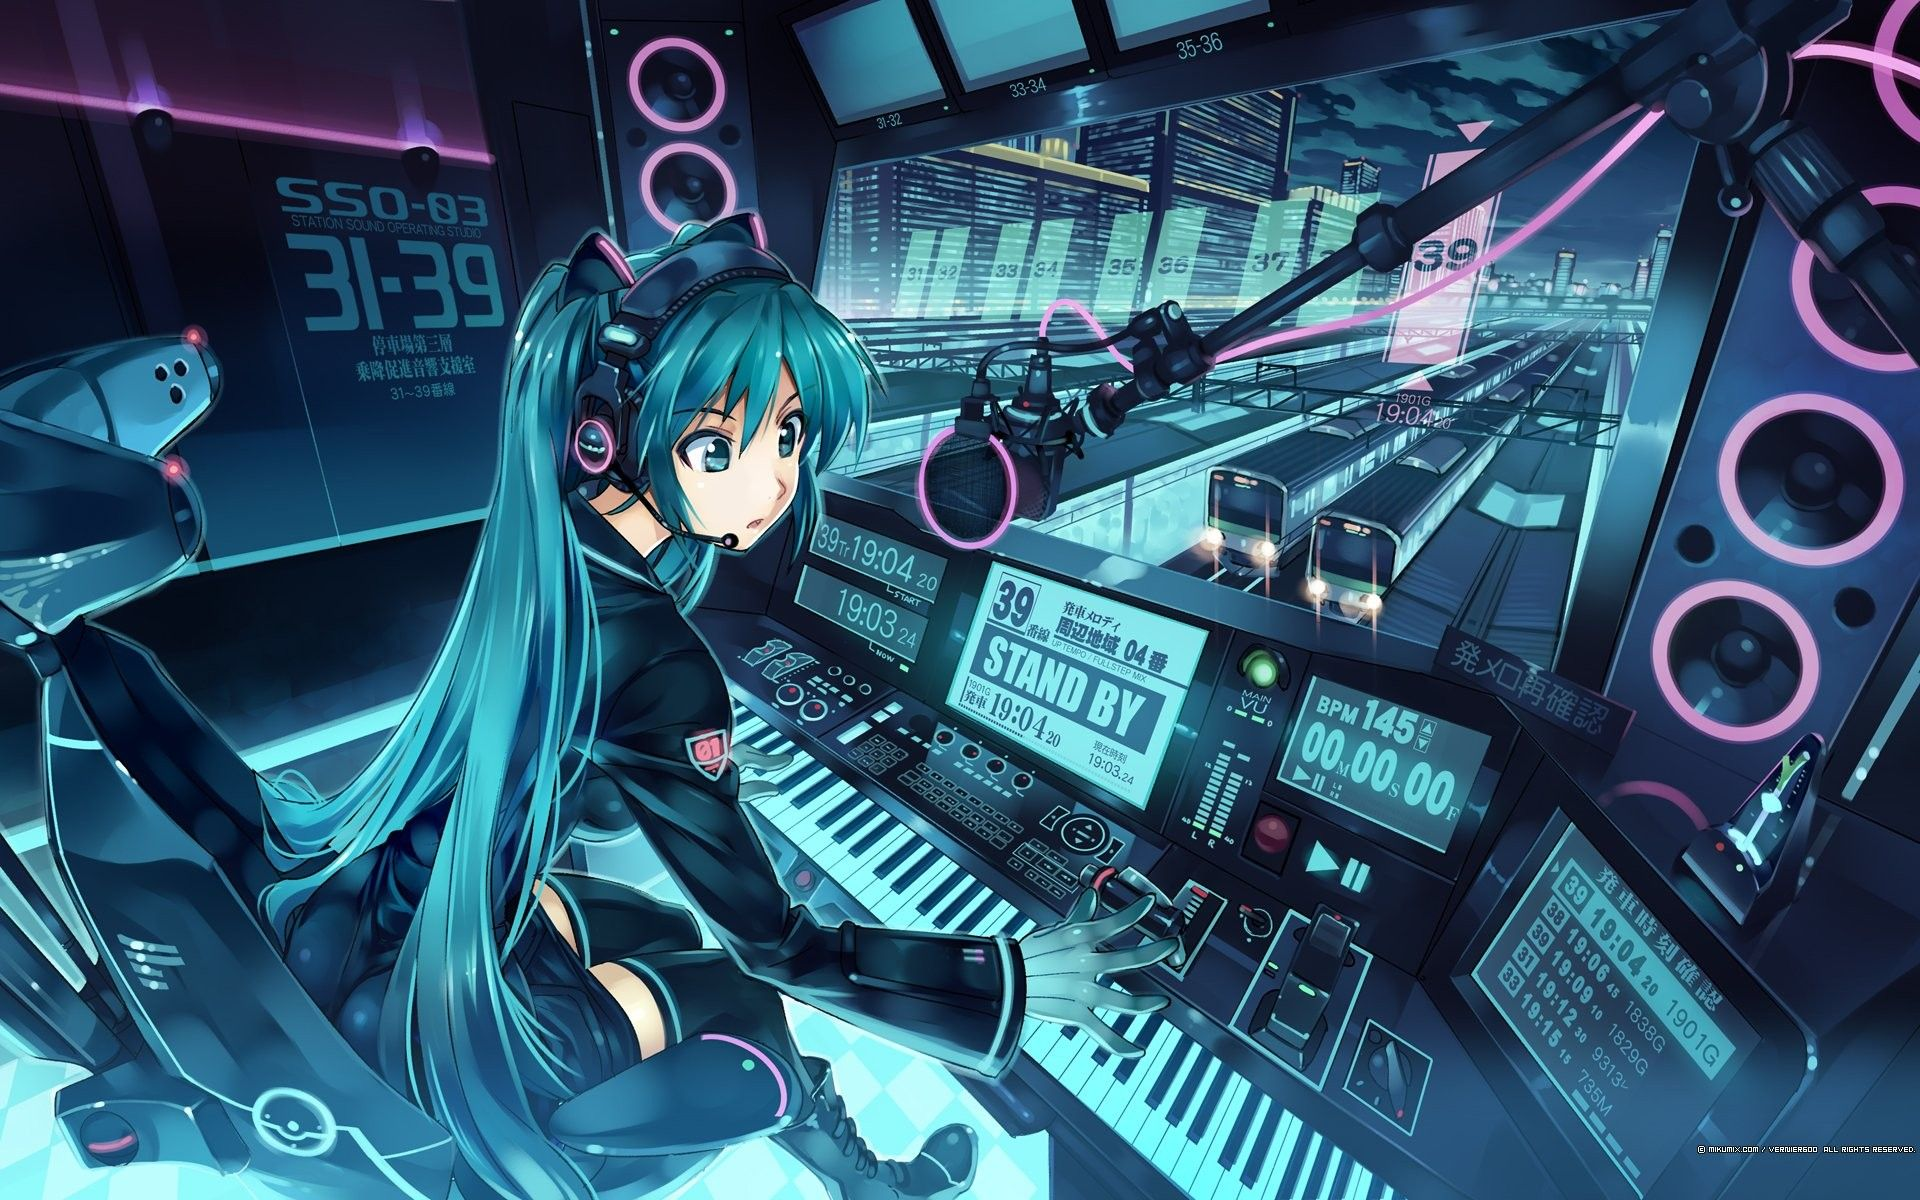 Vocaloid 初音ミク 1920x1200 高画質pc Ps3壁紙 4 アニメ 音楽